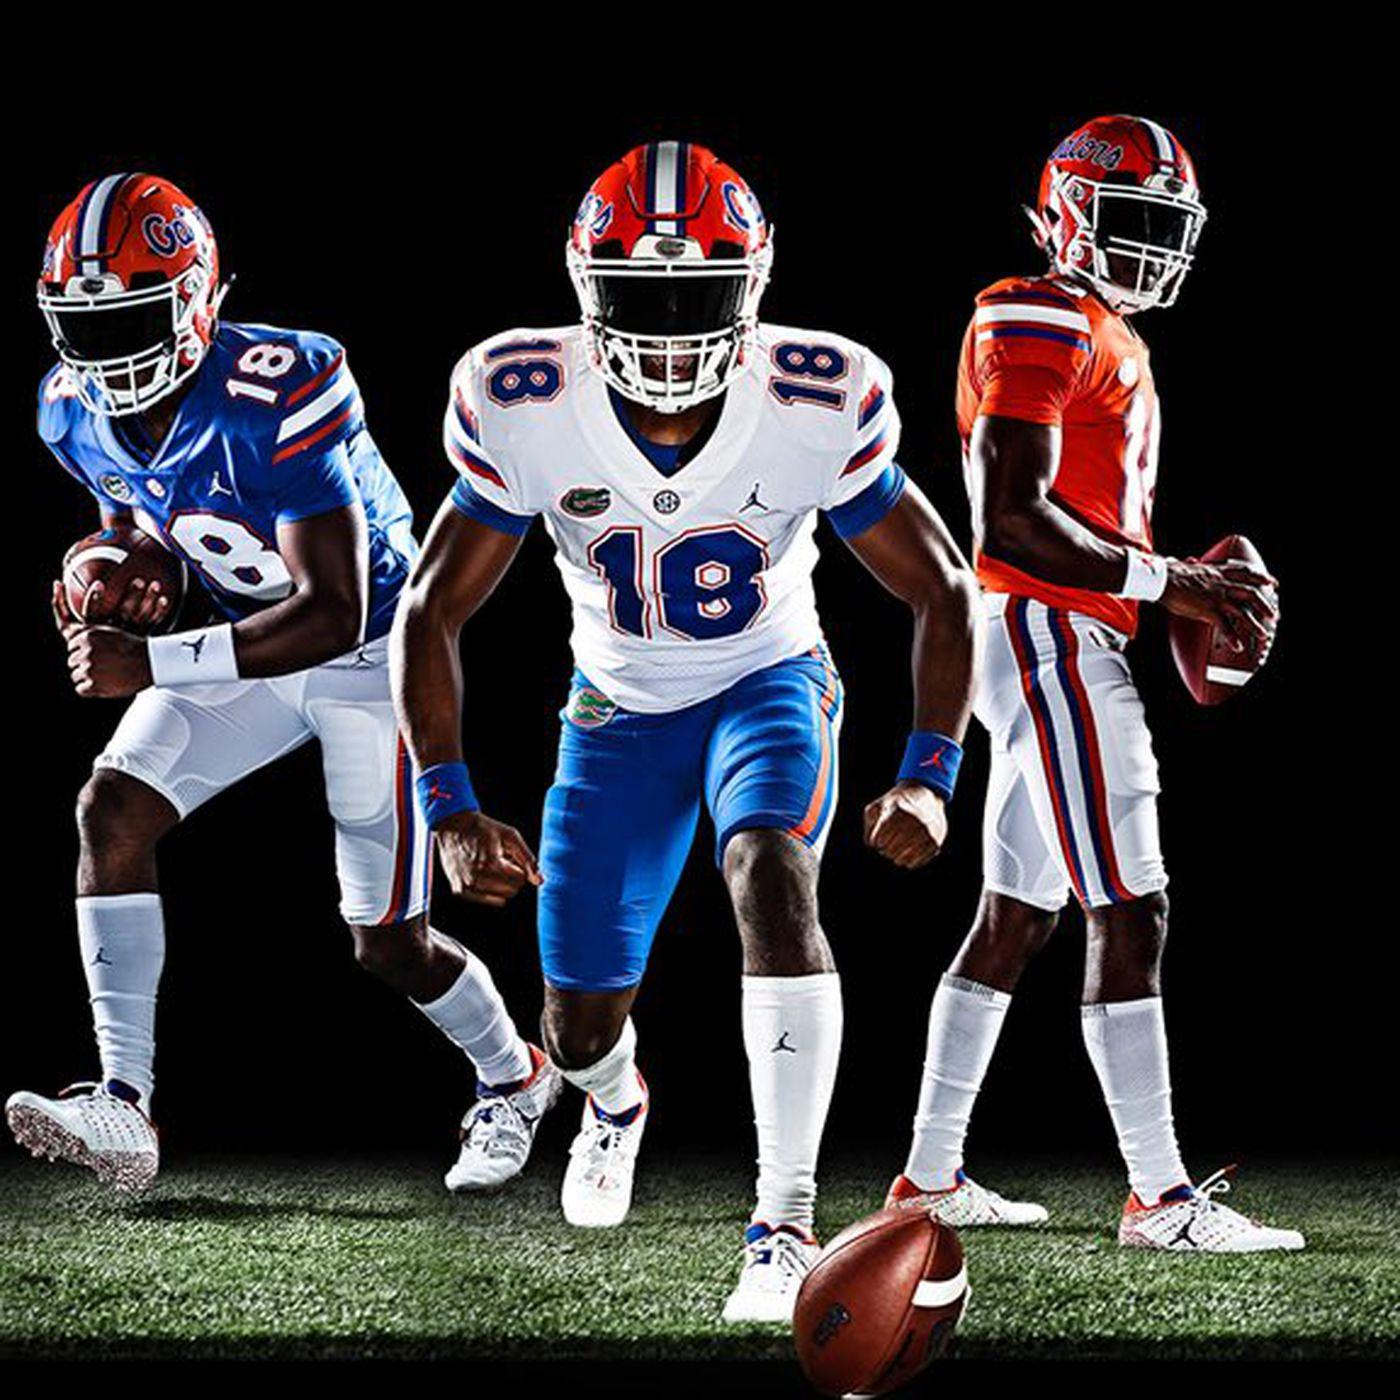 5af8be87eaa Florida unveils Jordan Brand uniforms